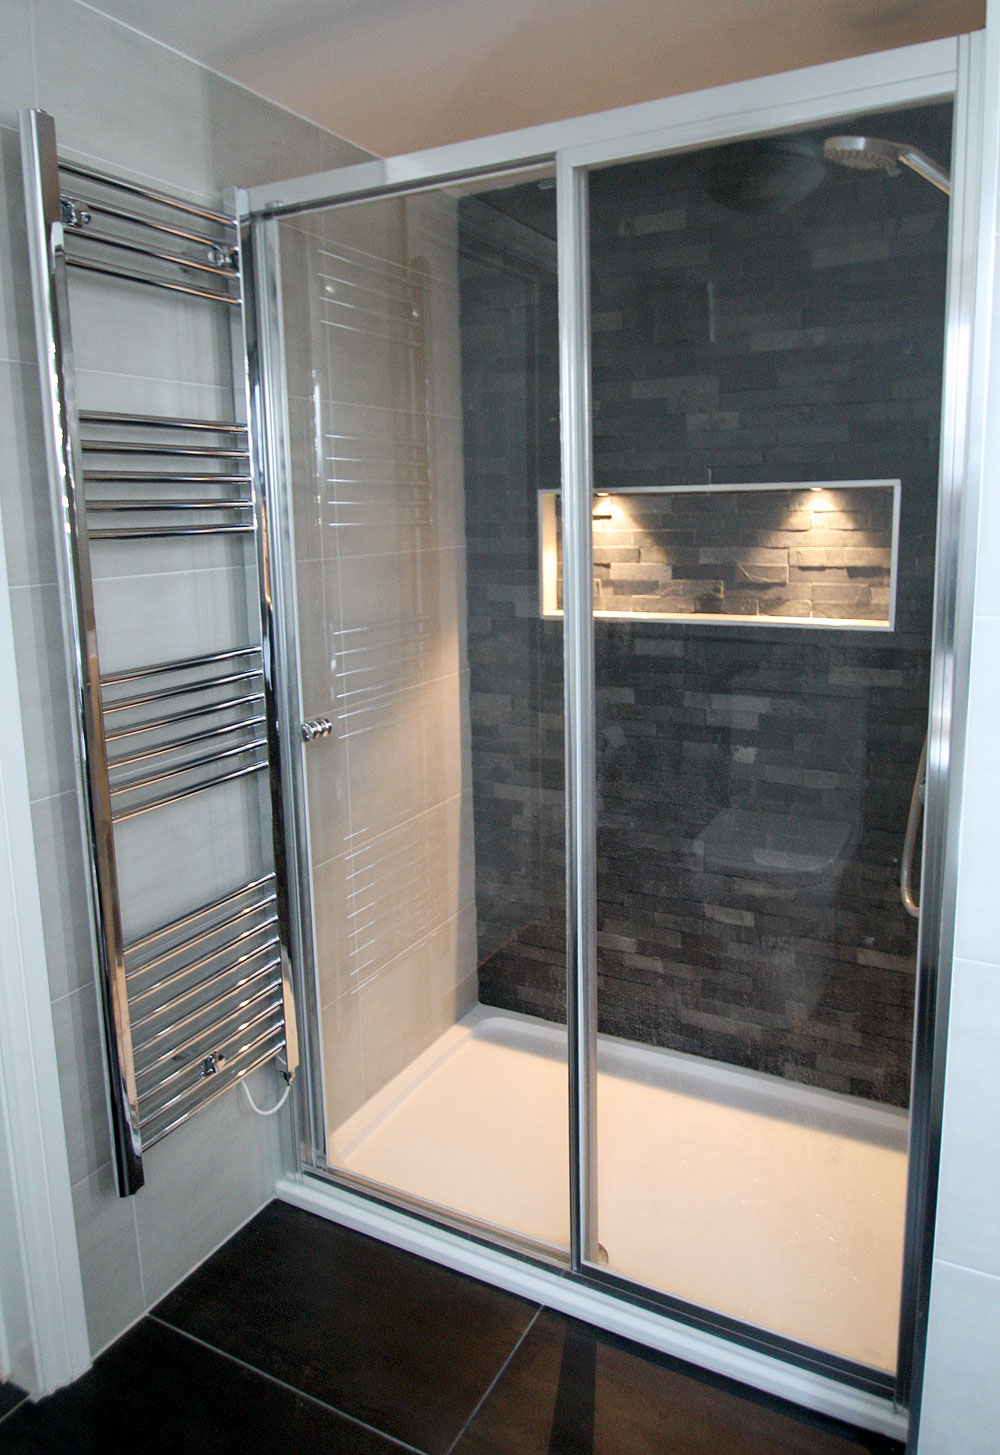 Bathroom Renovations Kingston Ontario: Shower Room Refurbishment In Kingston Upon Thames